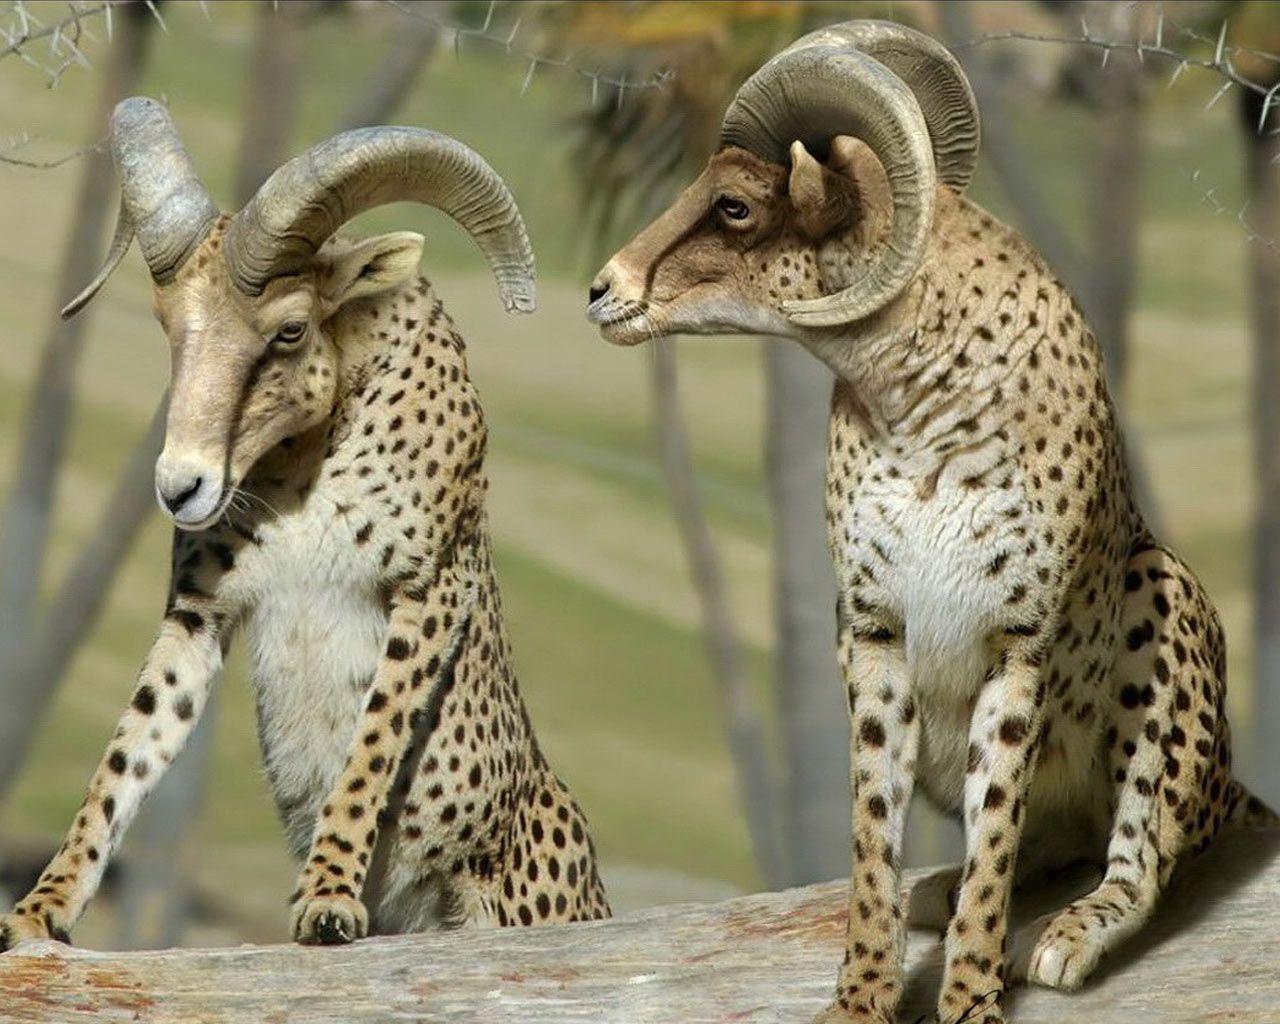 Cheetah Lion Hybrid Google Search Funny Pinterest